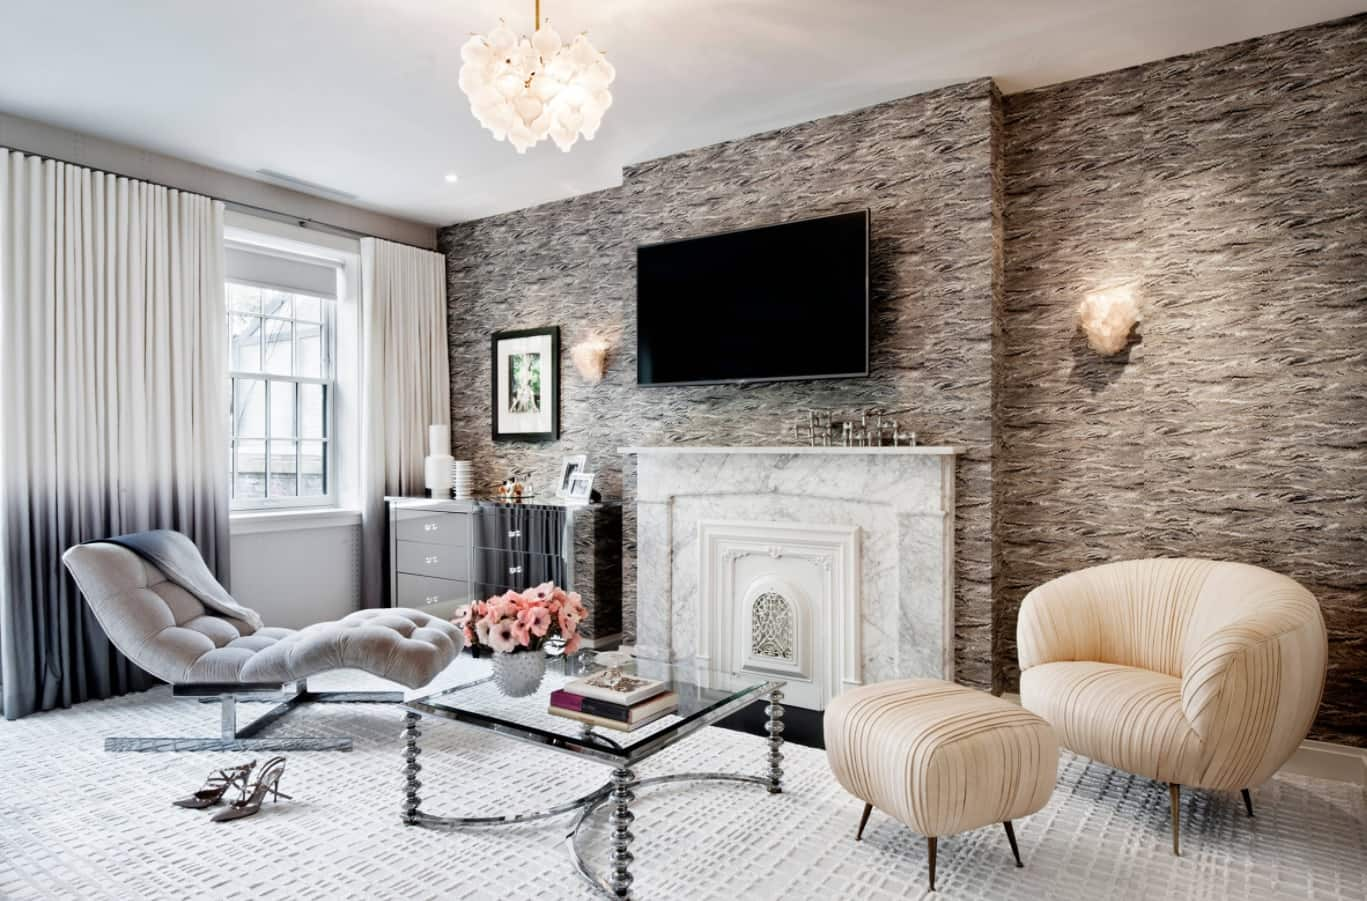 Best Townhouse Decor Ideas. Stone wall clasdding and light wooden laminated floor